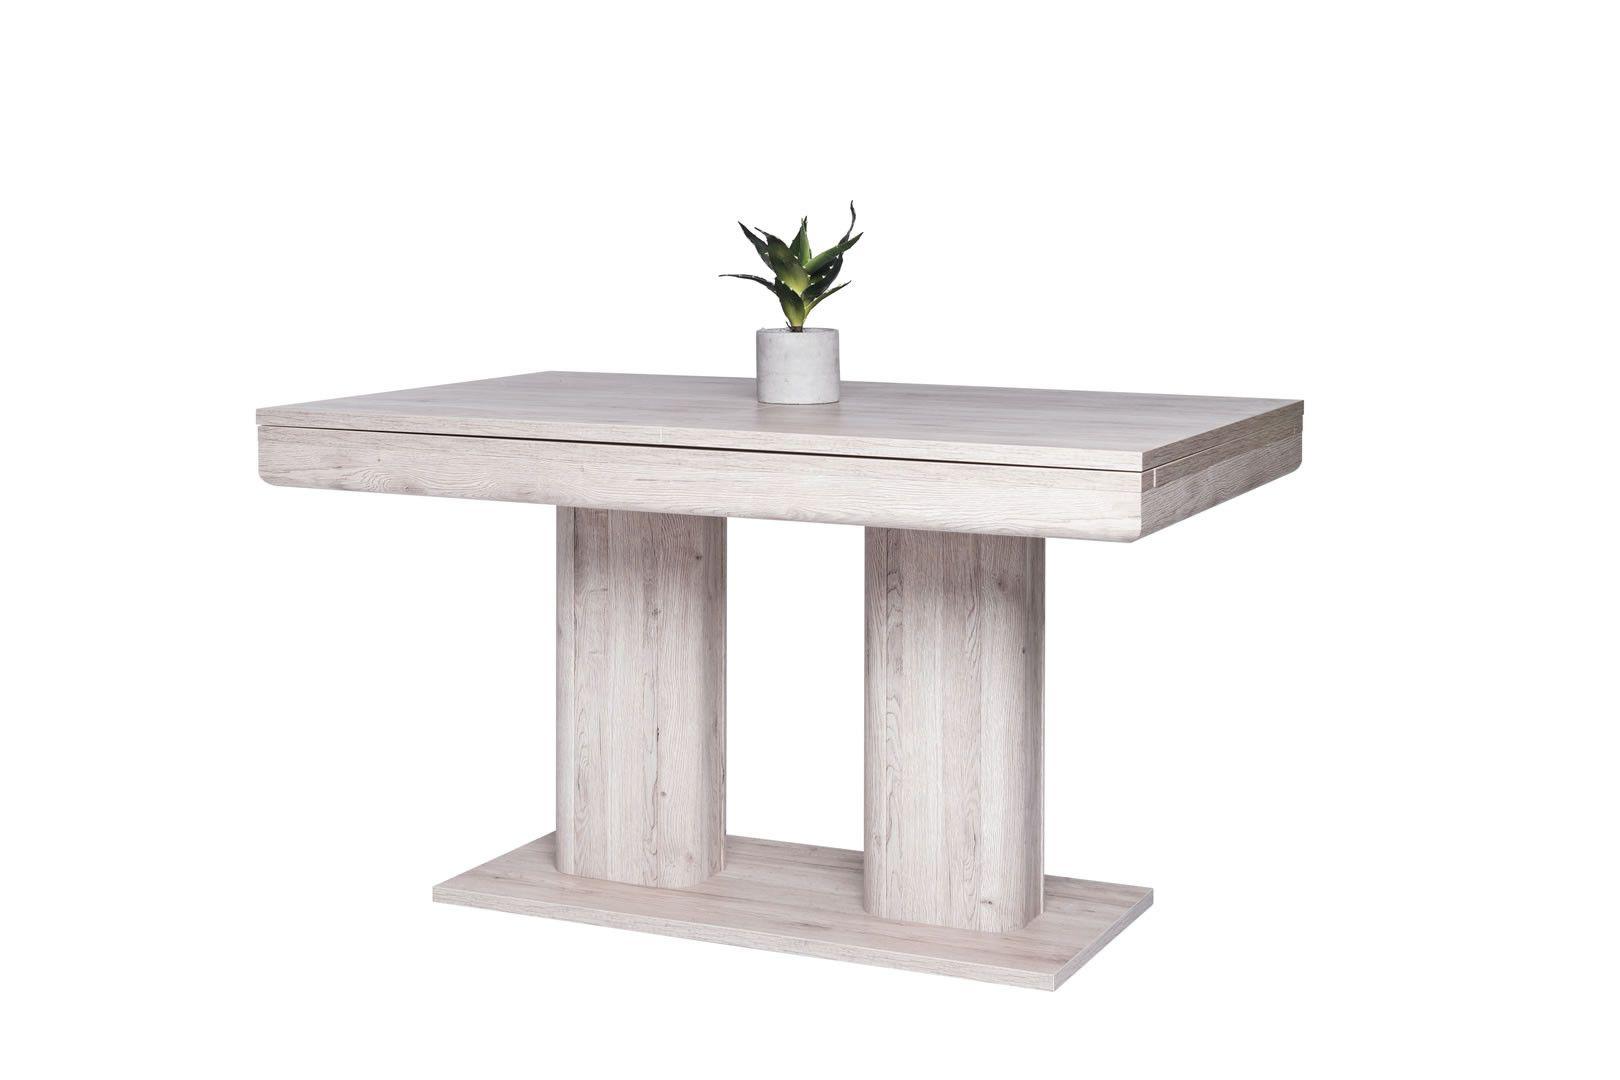 tables rectangulaires table de salle manger extensible. Black Bedroom Furniture Sets. Home Design Ideas